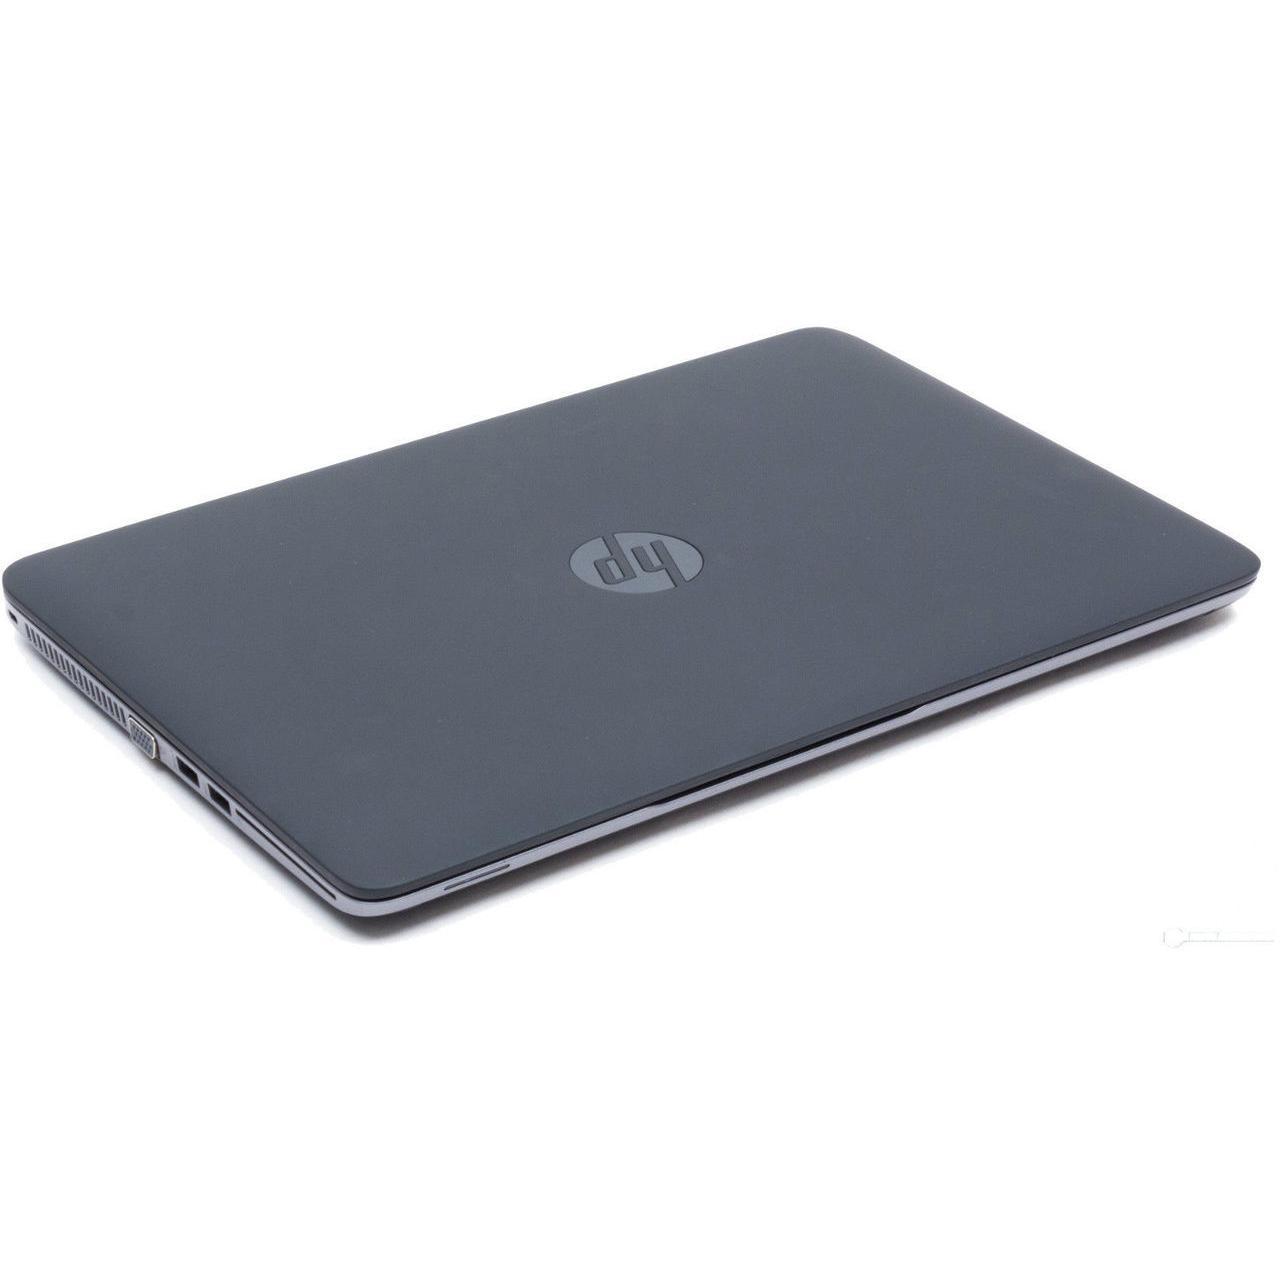 "HP Elitebook 840 g1 14"" (2013) - Core i5-4200U - 8GB - HDD 320 GB AZERTY - Francúzska"